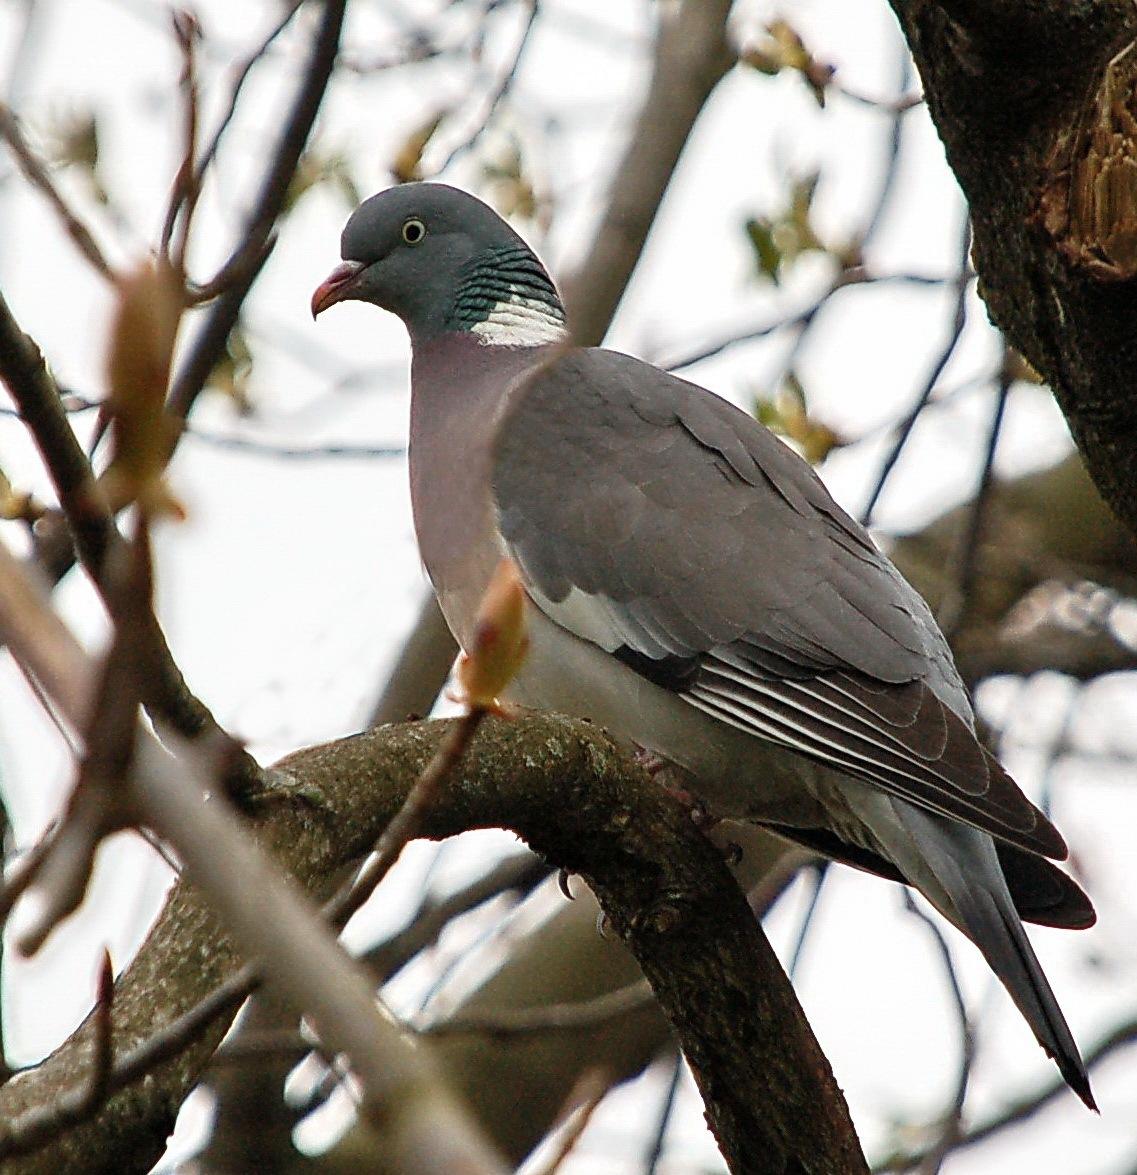 Wood pigeon by Per Molvik